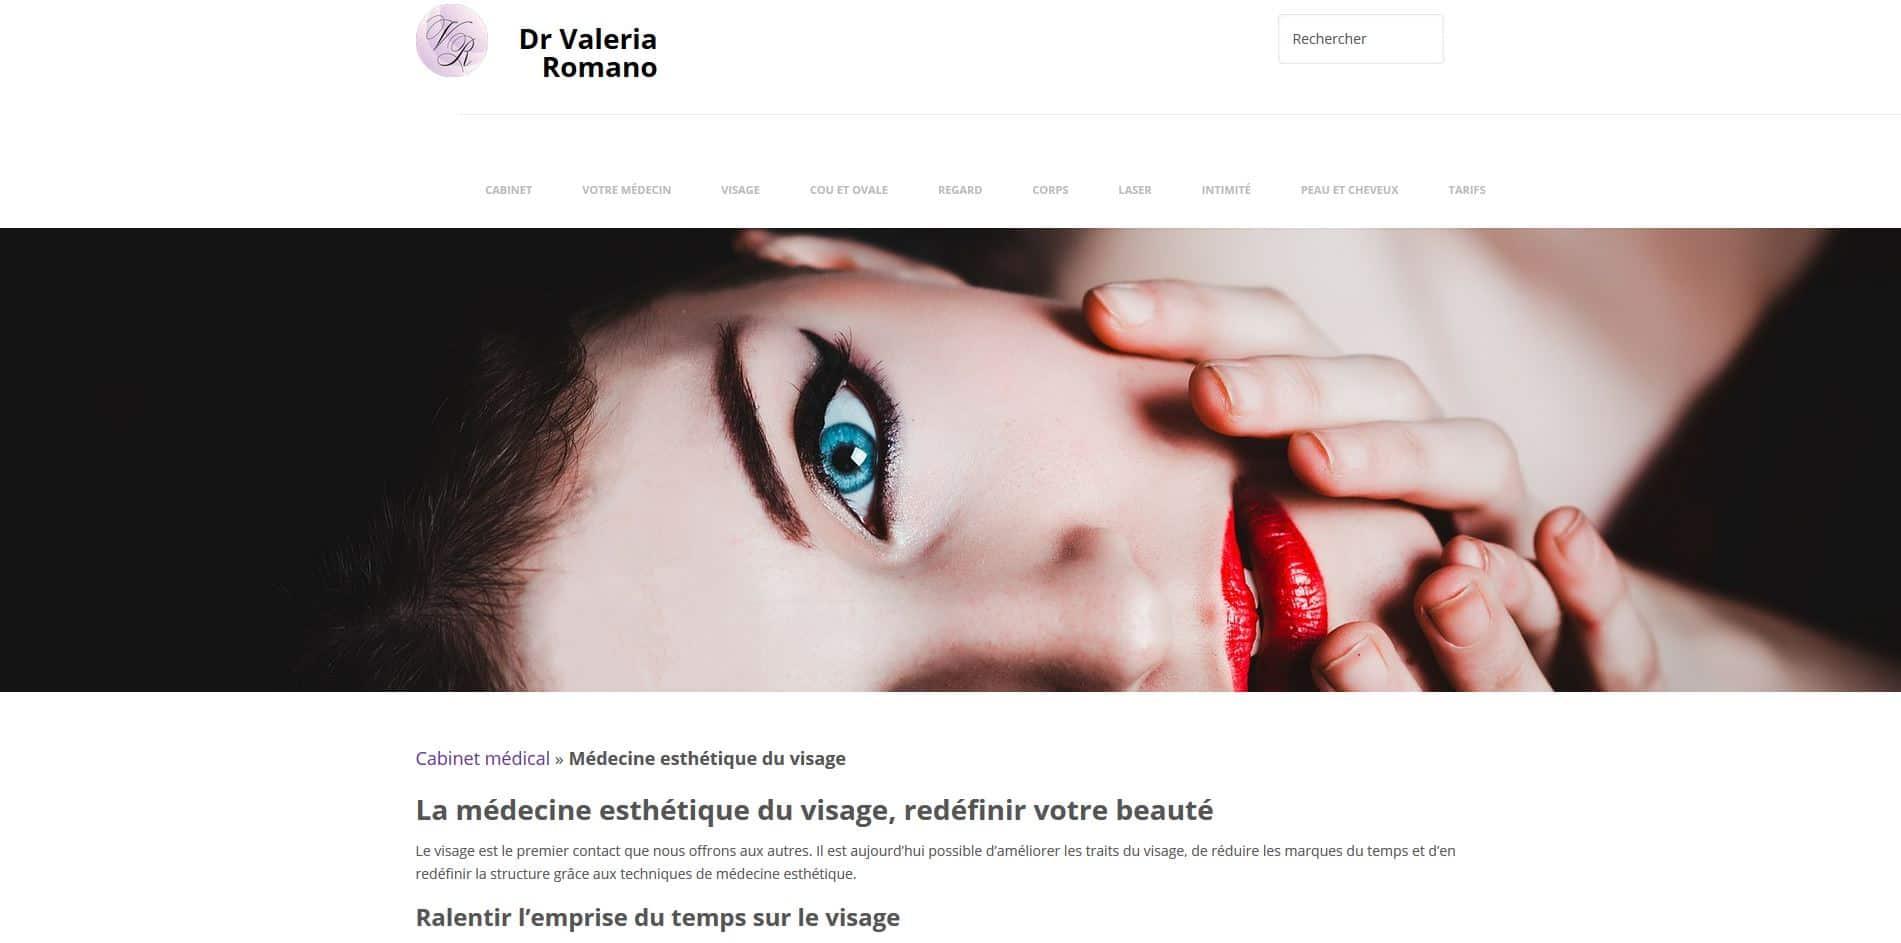 refonte site internet medecin paris